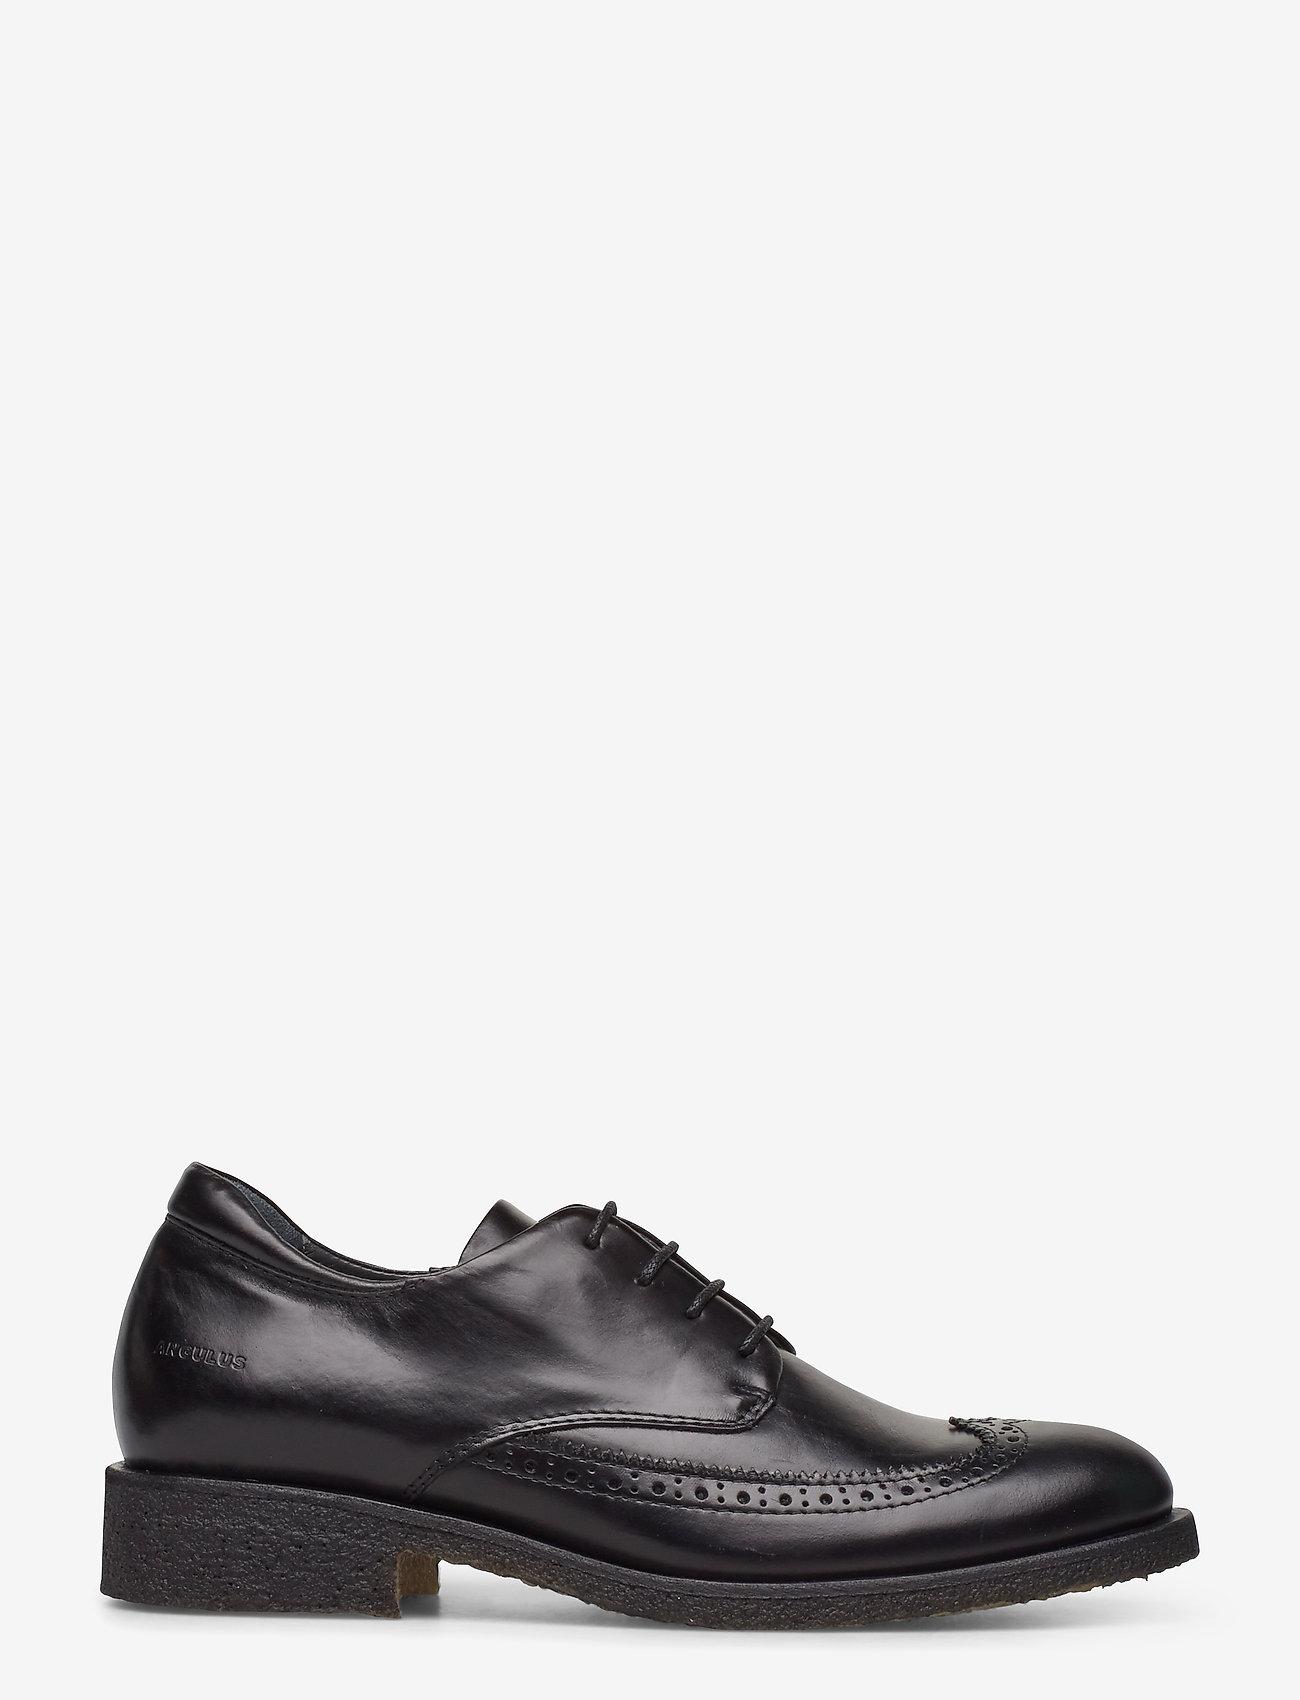 ANGULUS - Shoes - flat - with lace - buty sznurowane - 1835 black - 1